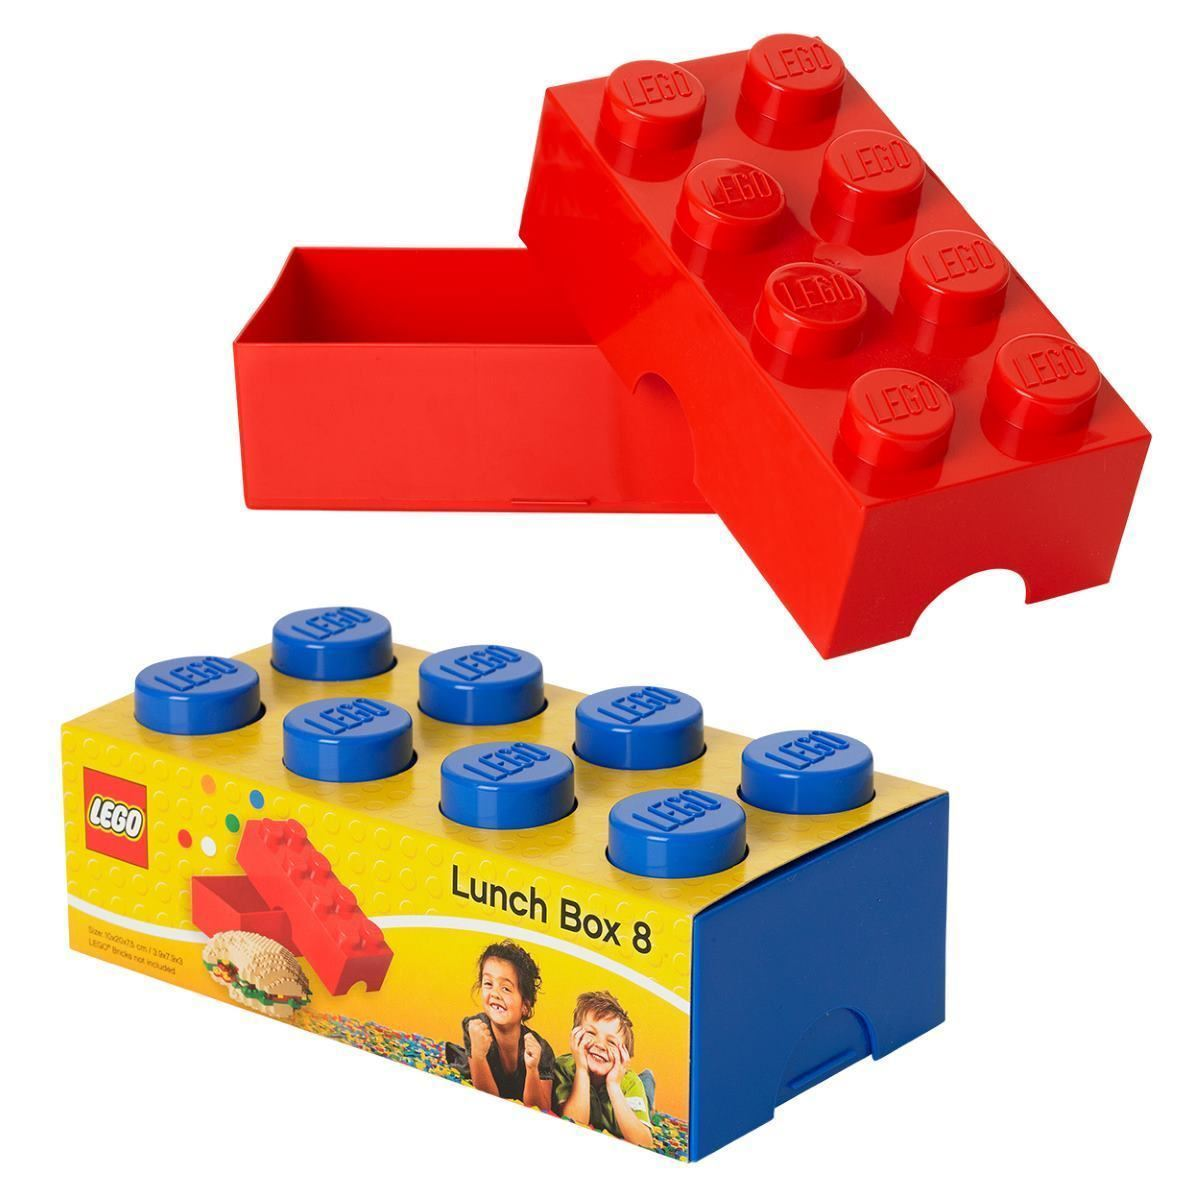 Lego Lunch Box Blue Red School Lunch Sandwich Kids Snacks | eBay